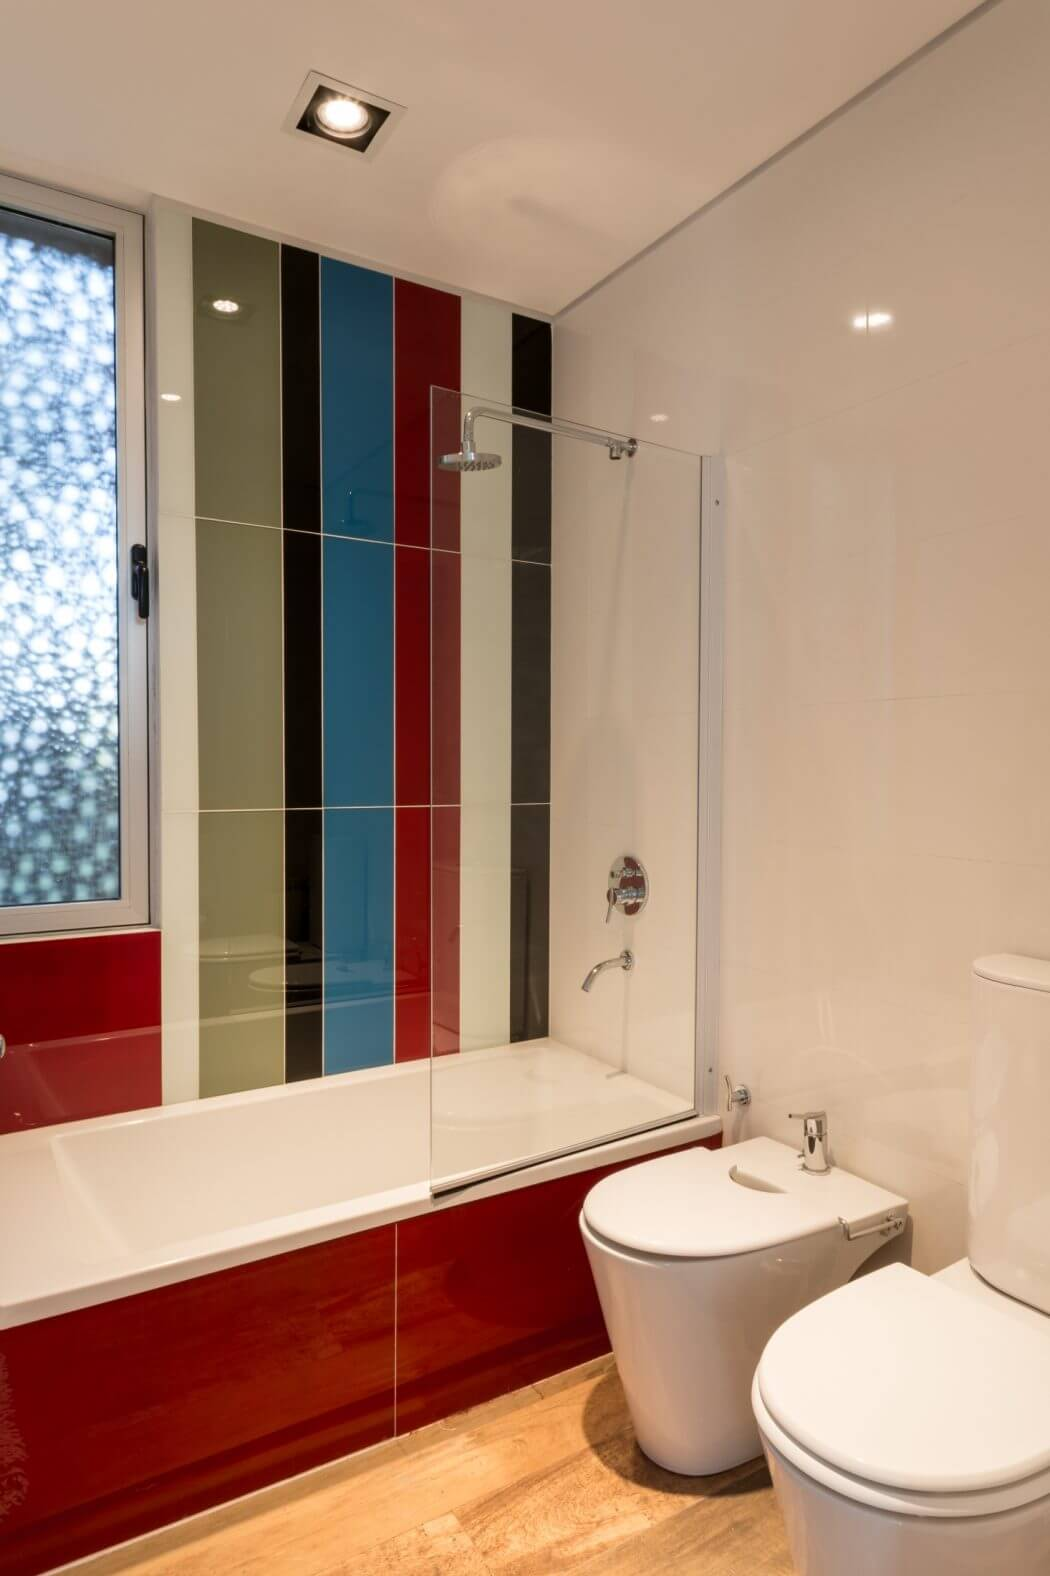 025-mooe-house-fcp-arquitectura-1050x1576